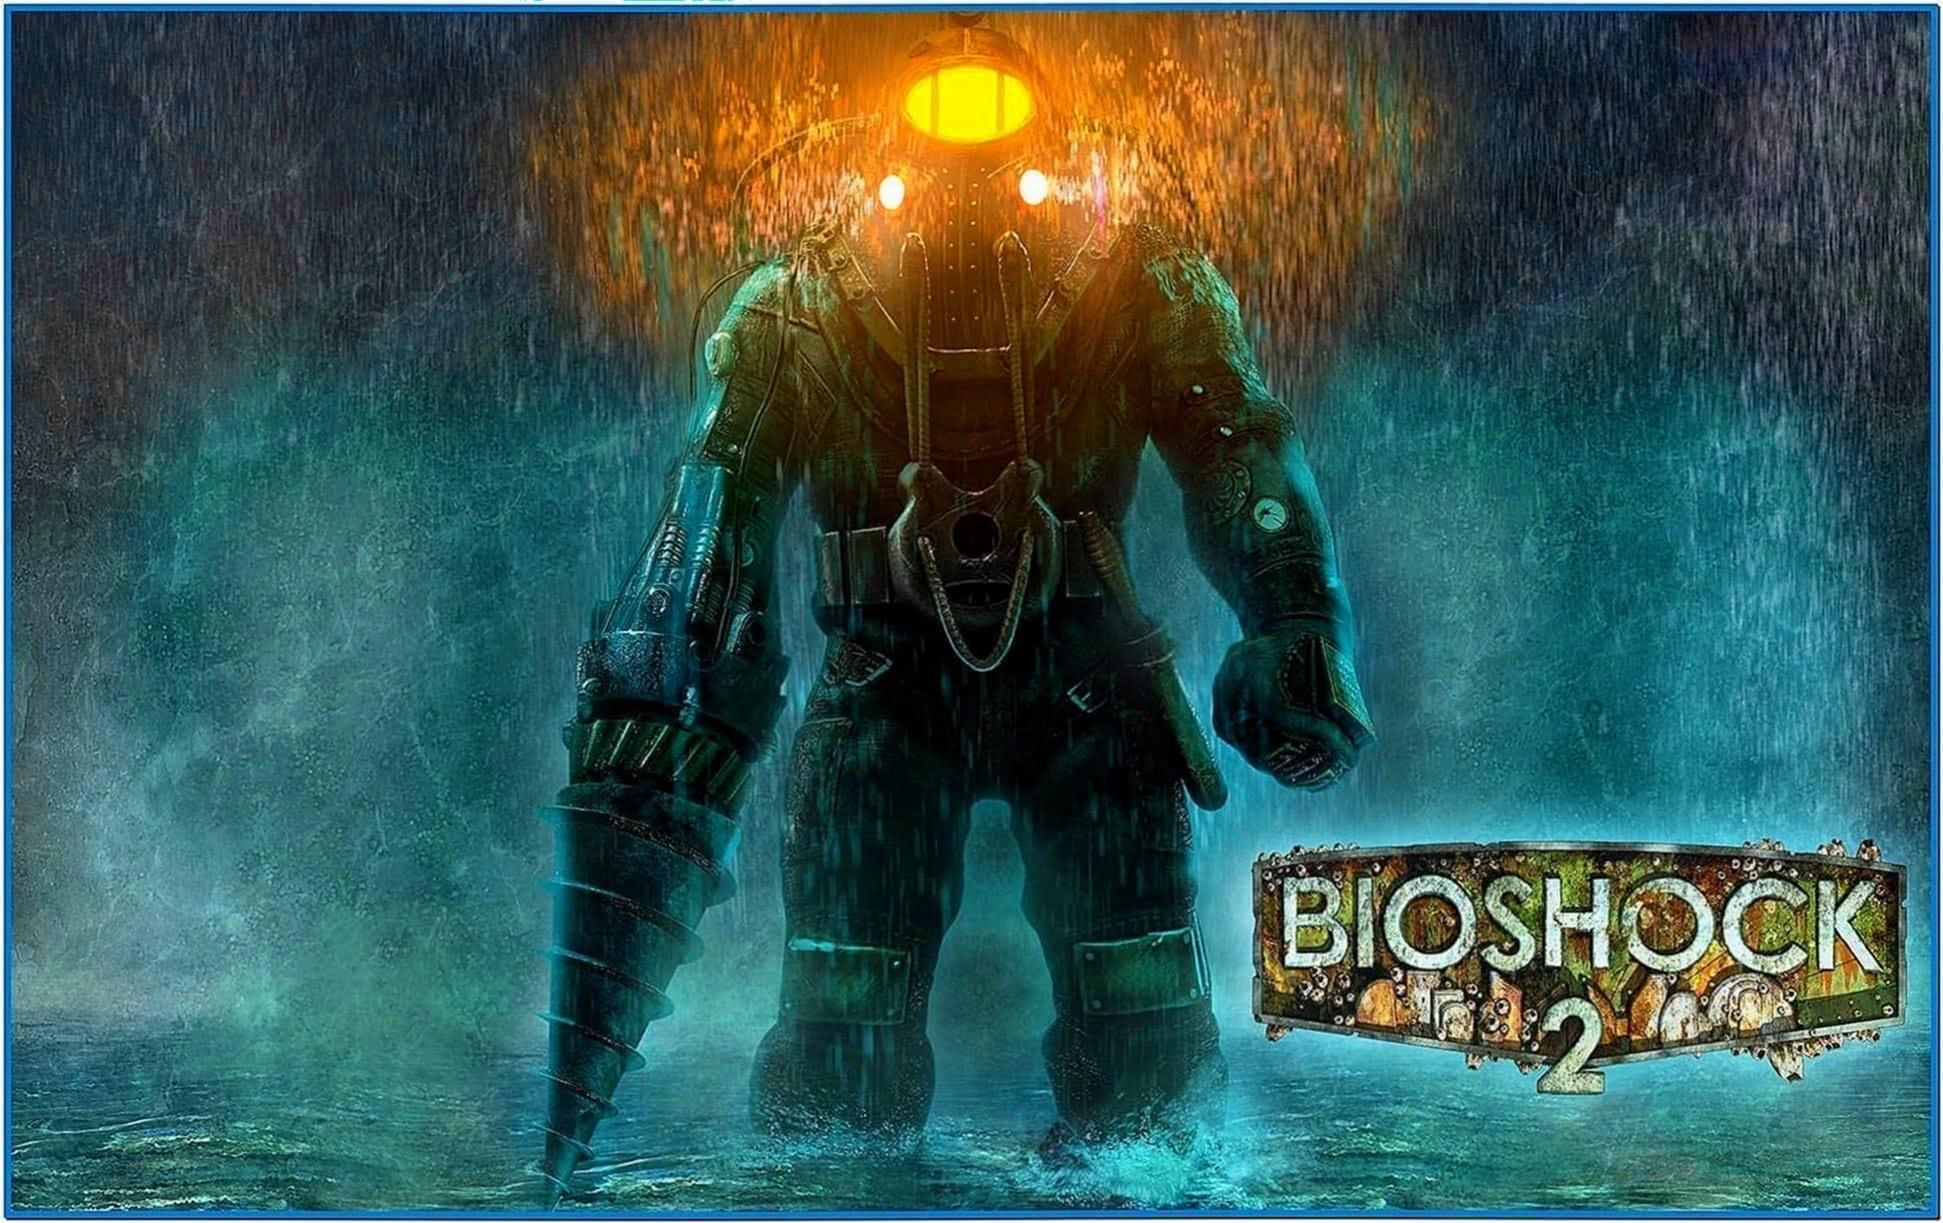 Bioshock 2 Screensaver